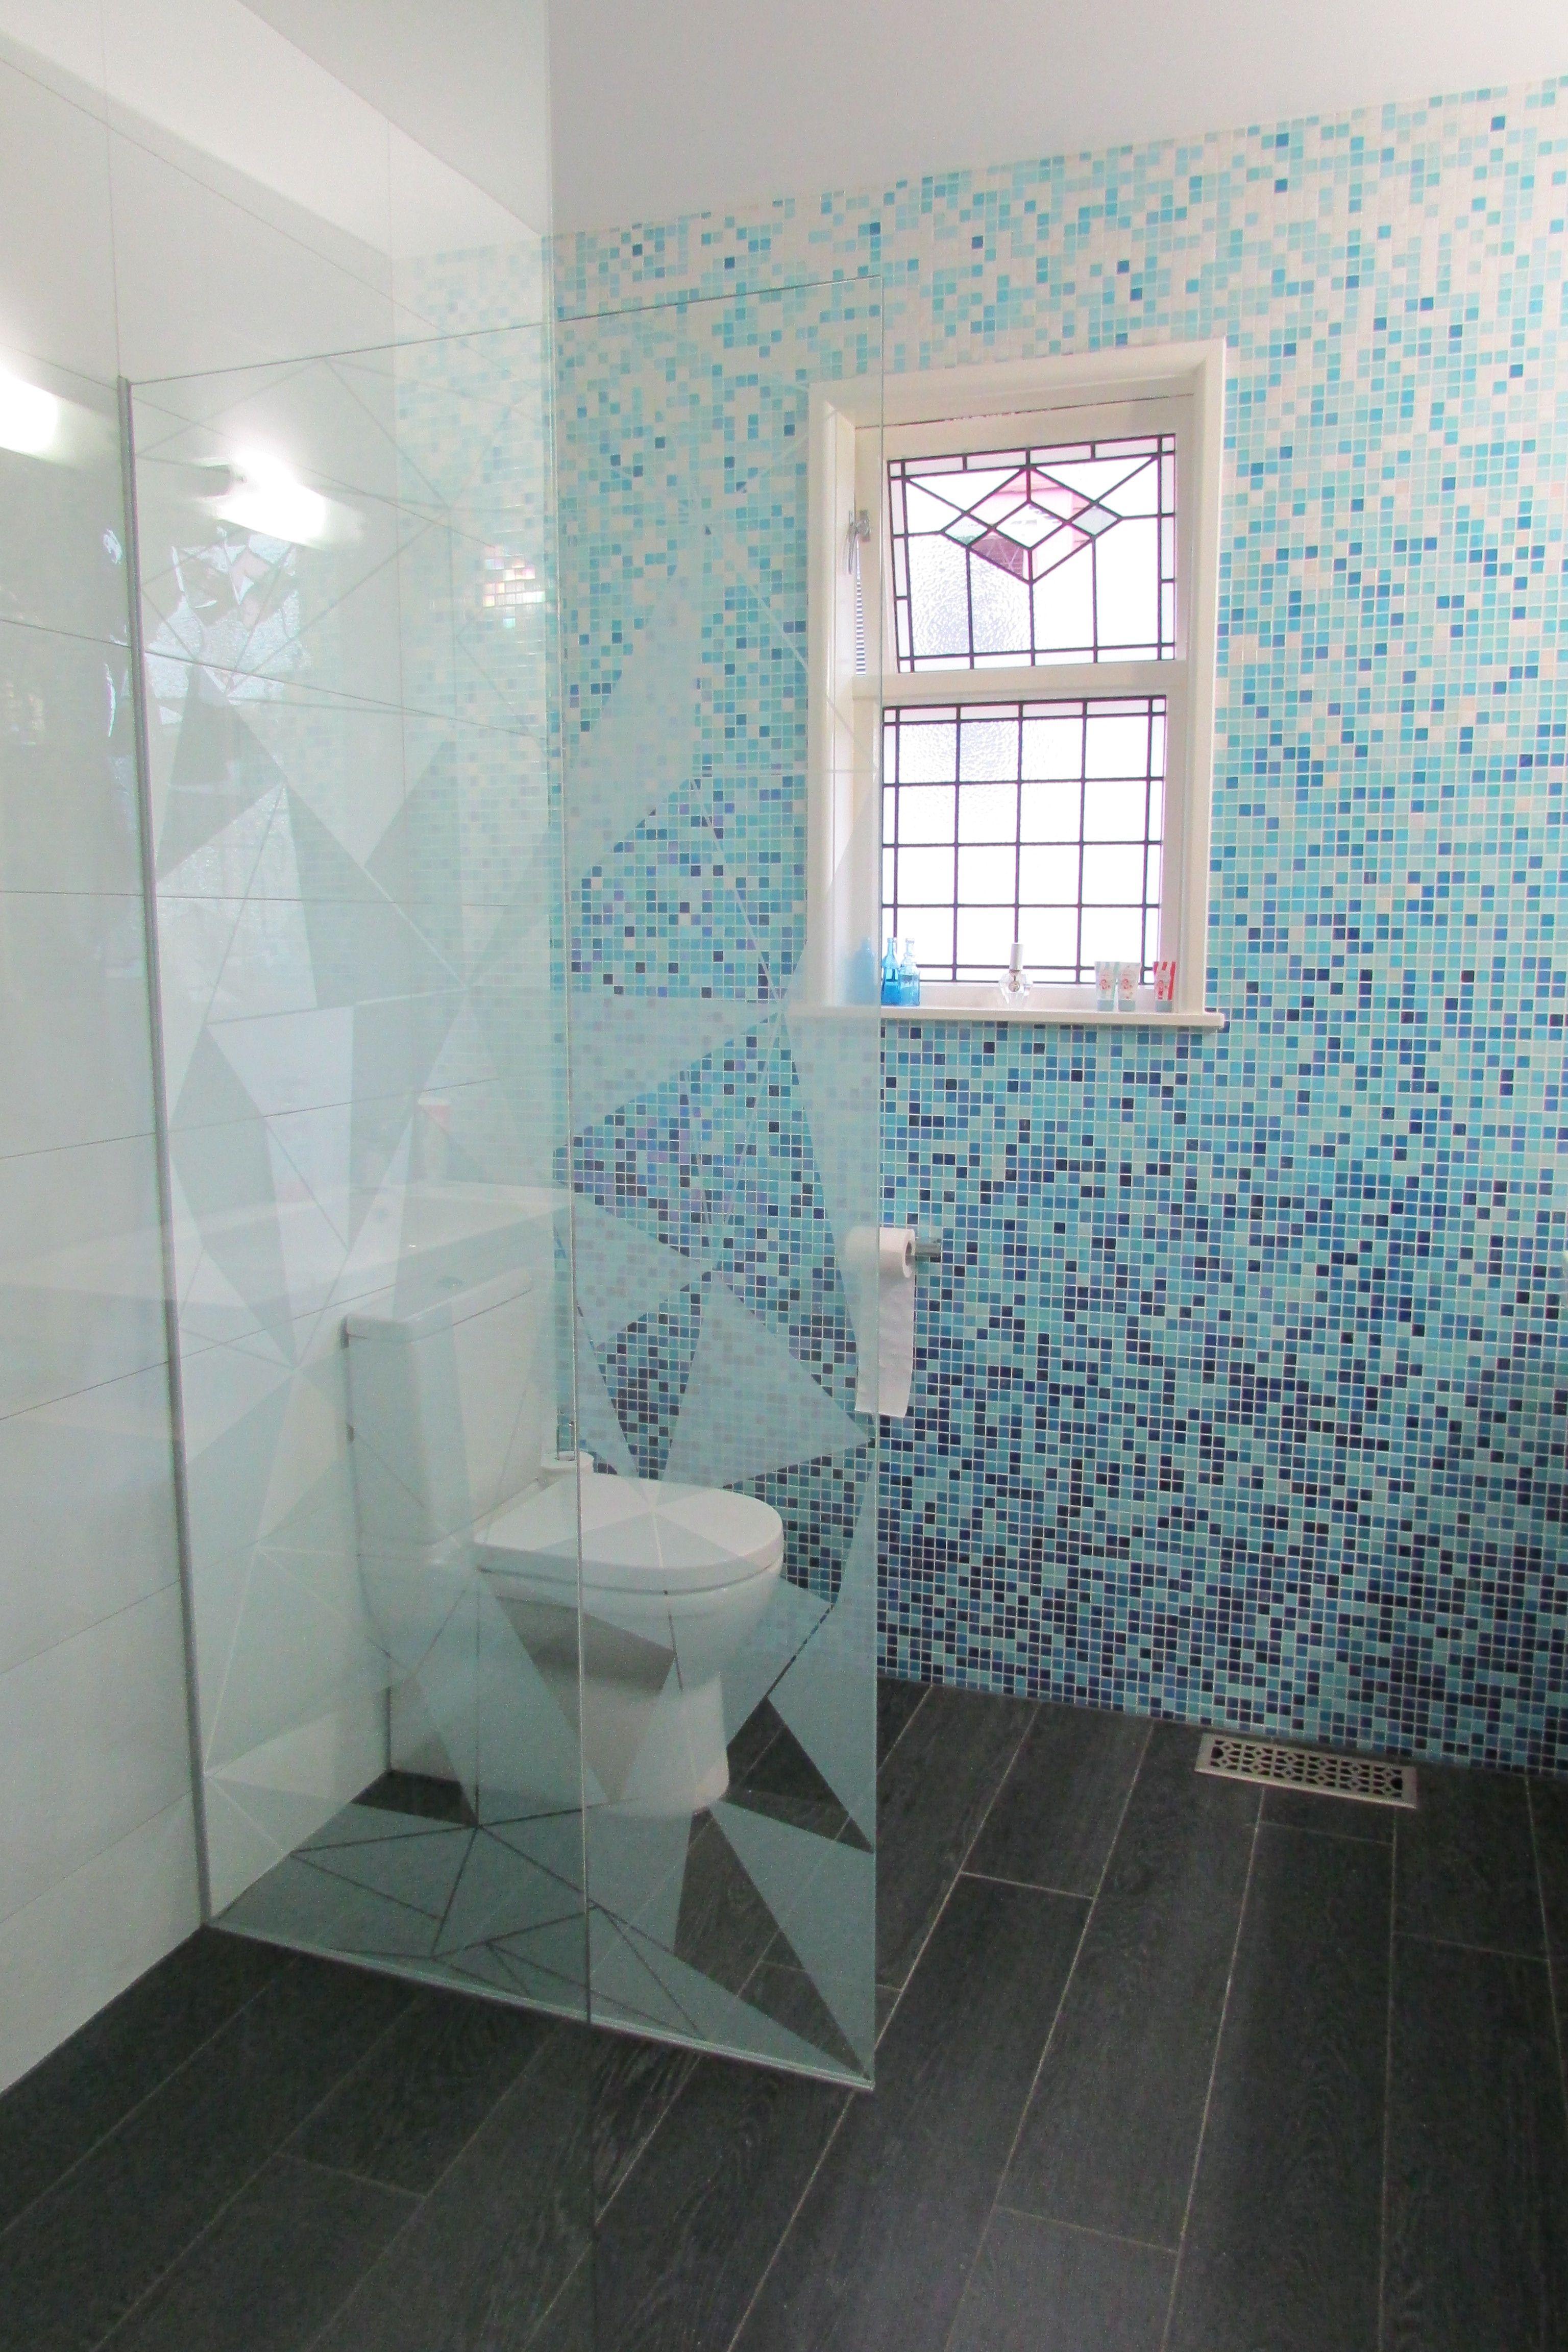 Bisazza gladiolo bioplank woodlook bathroom tile ideas for Bisazza bathroom ideas